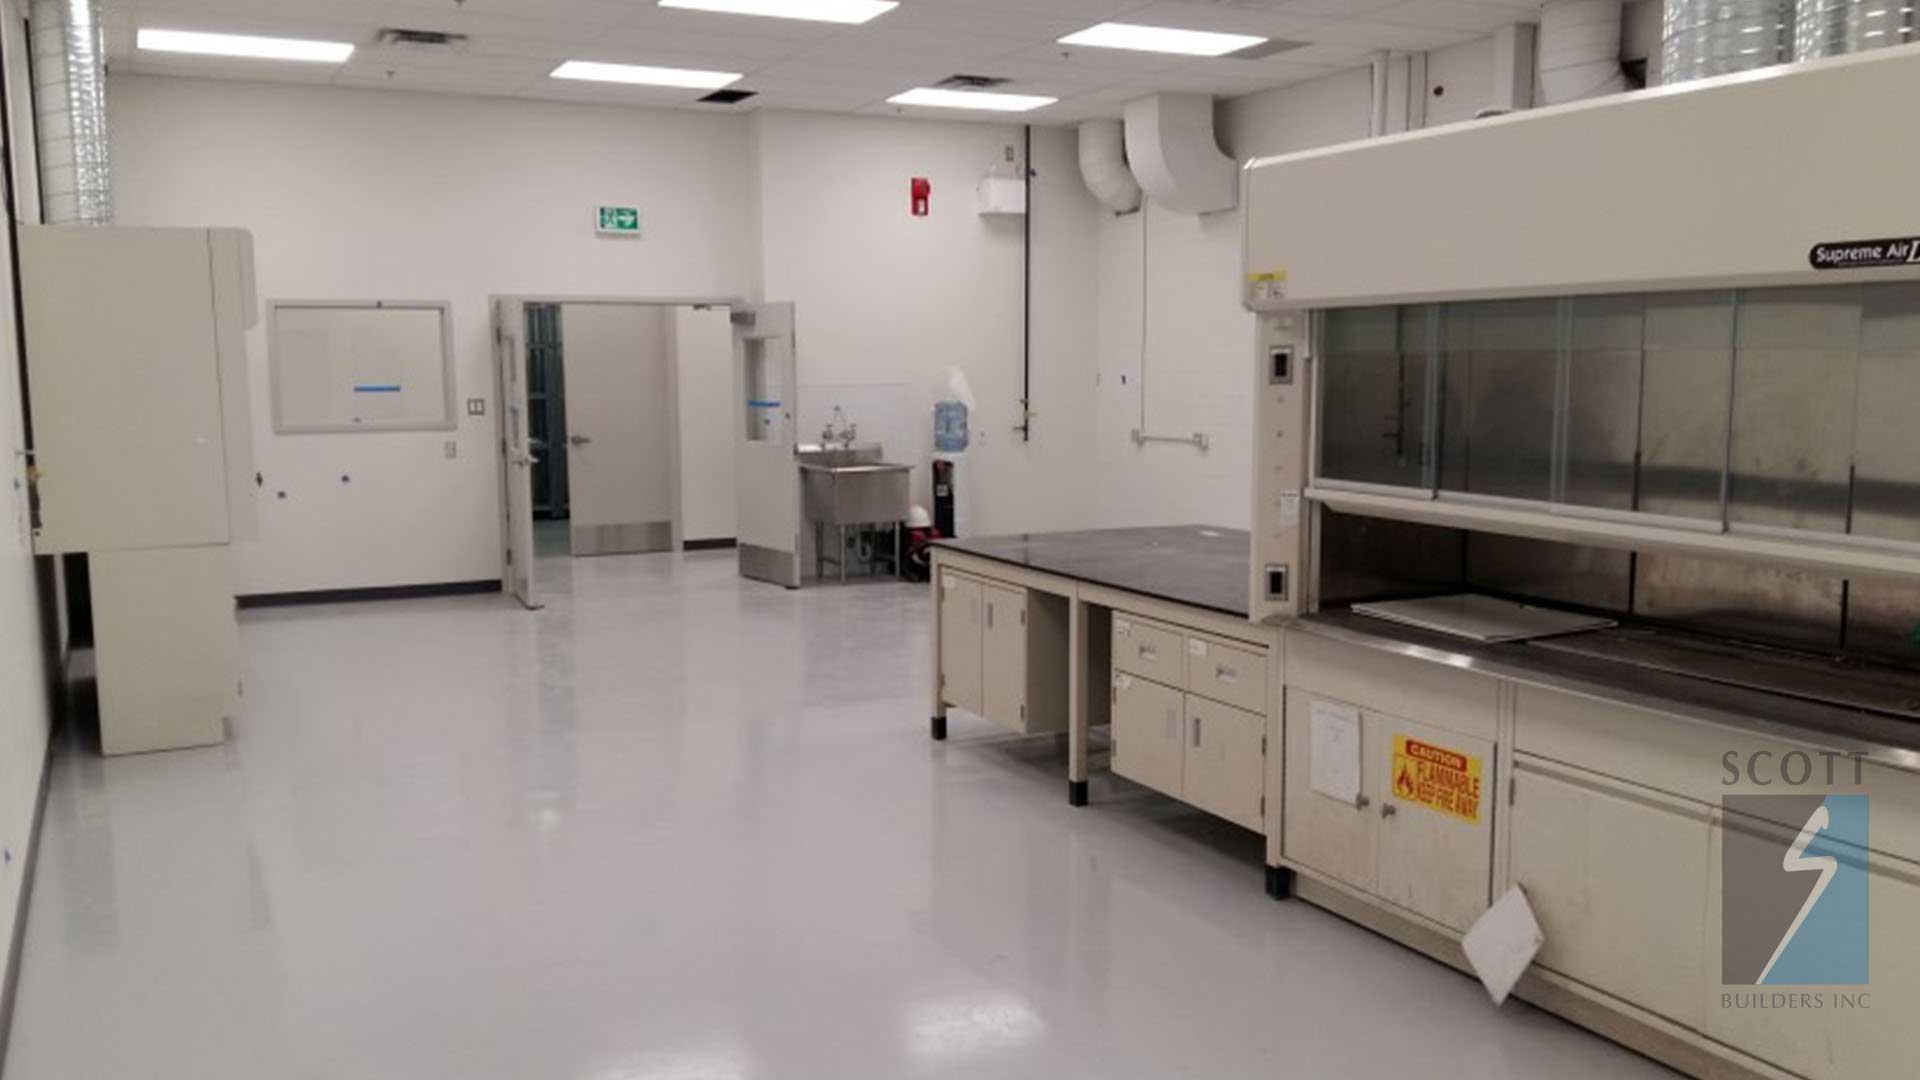 SBP-2366-Schlumberger-H2S-Lab-CGY-(3)